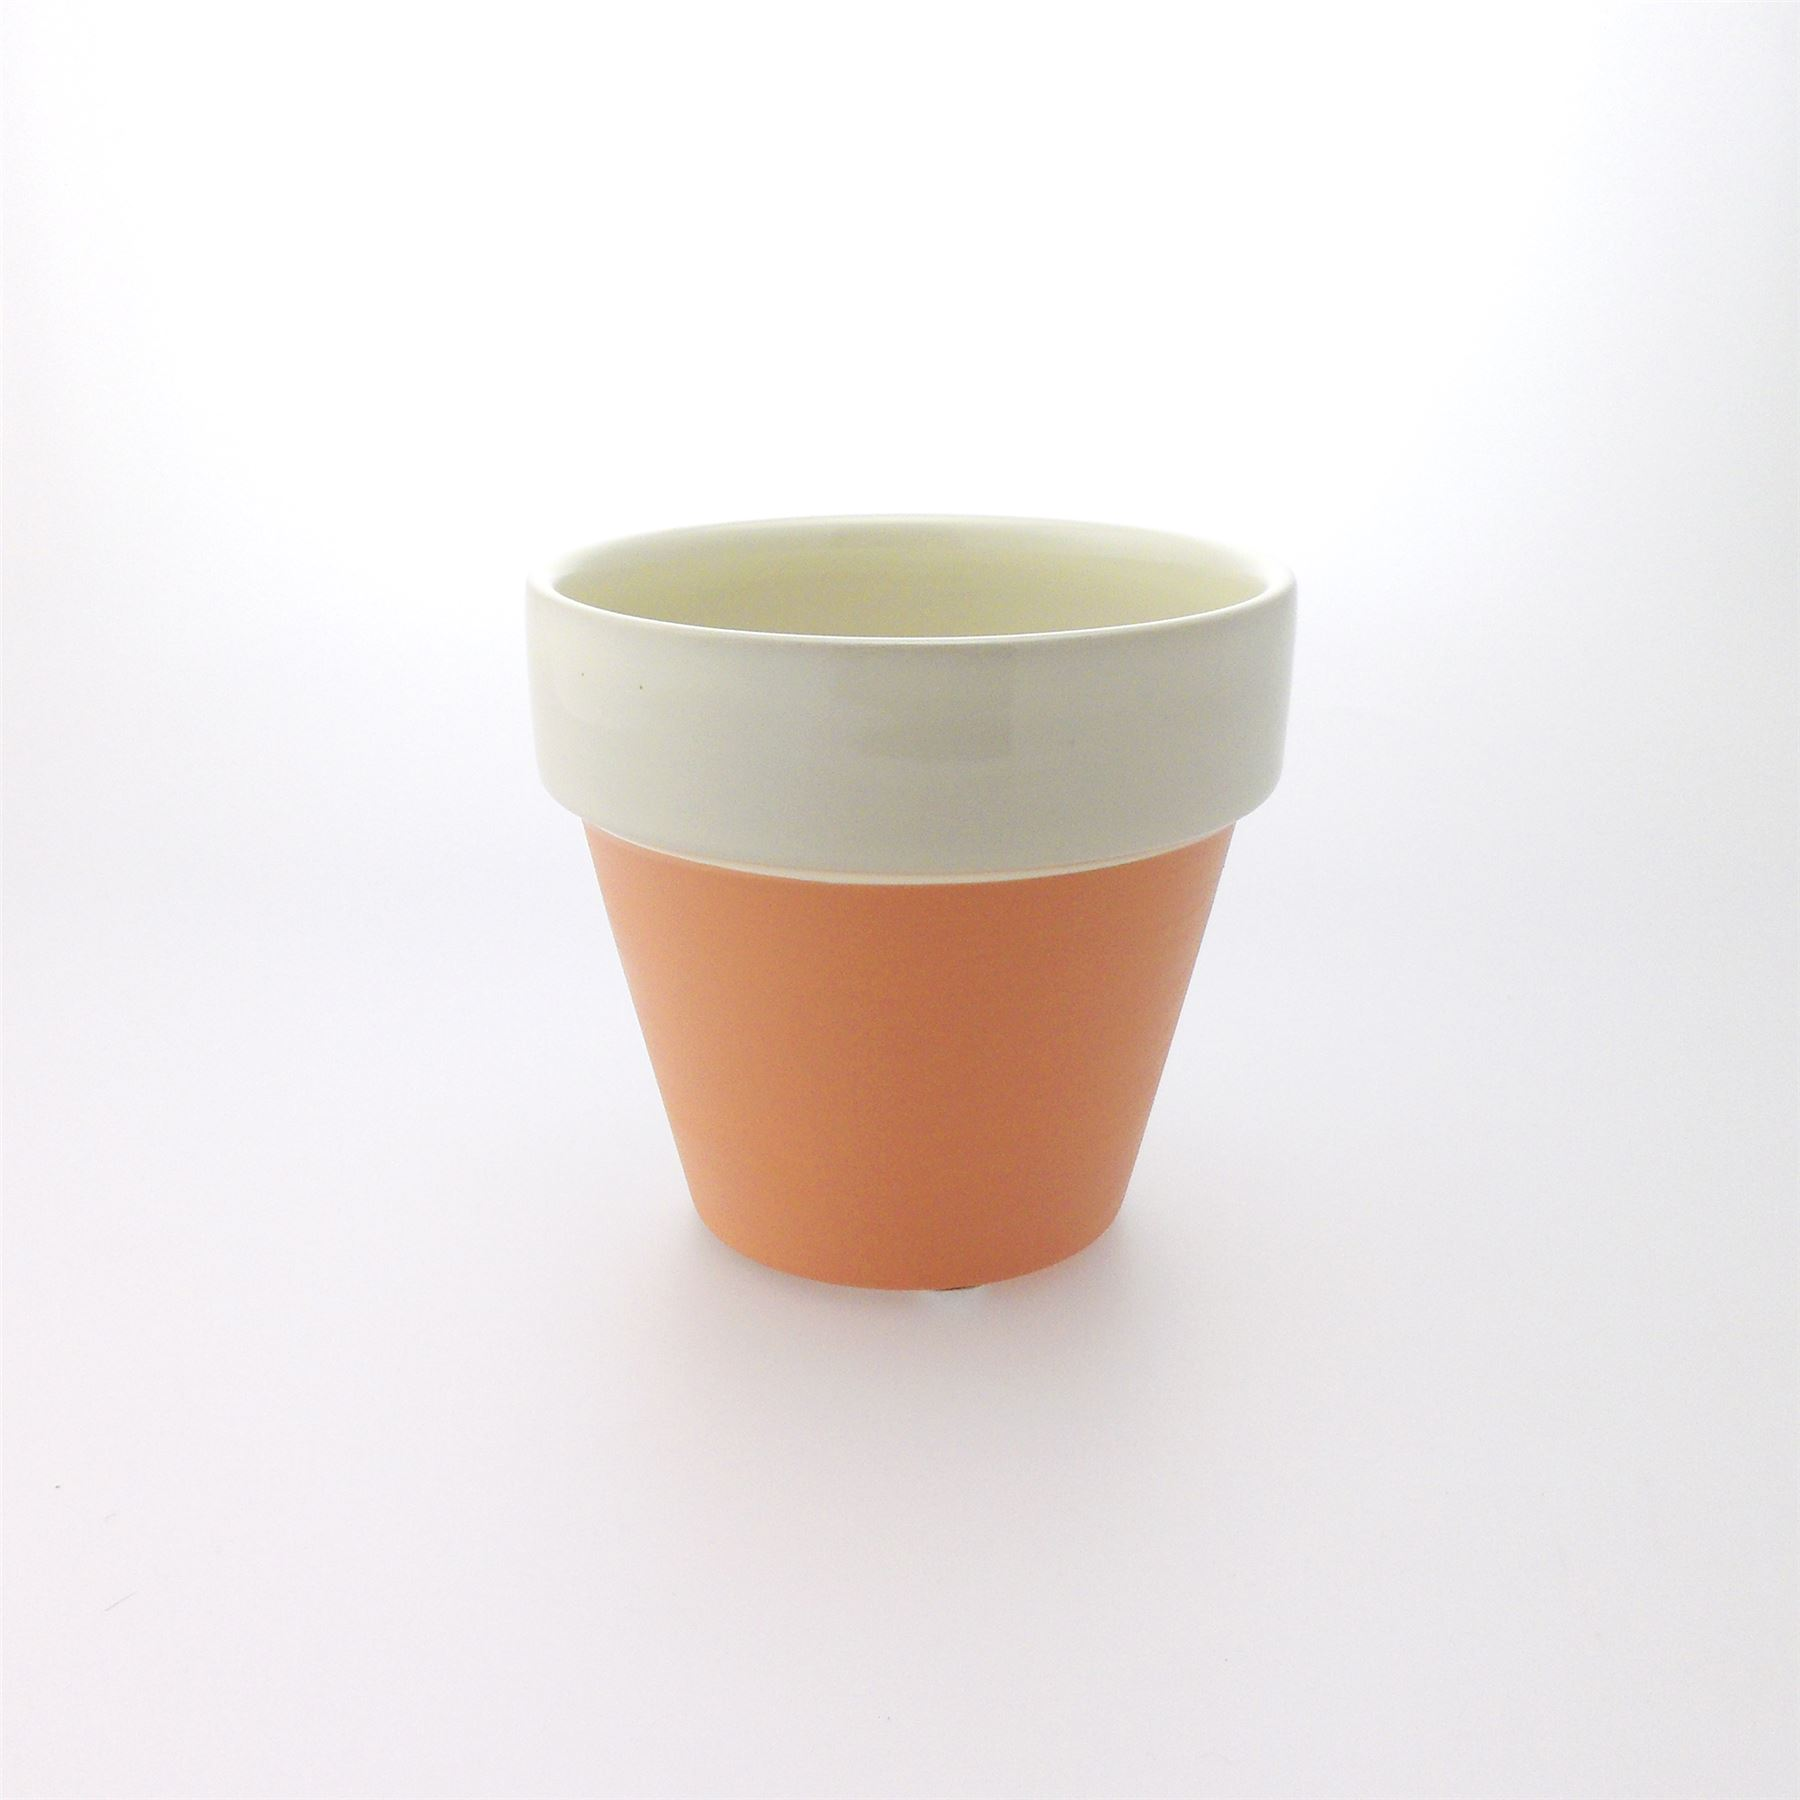 Flower Pots Terracotta: DECORATIVE TERRACOTTA PLANT LITTLE FLOWER POTS CLAY